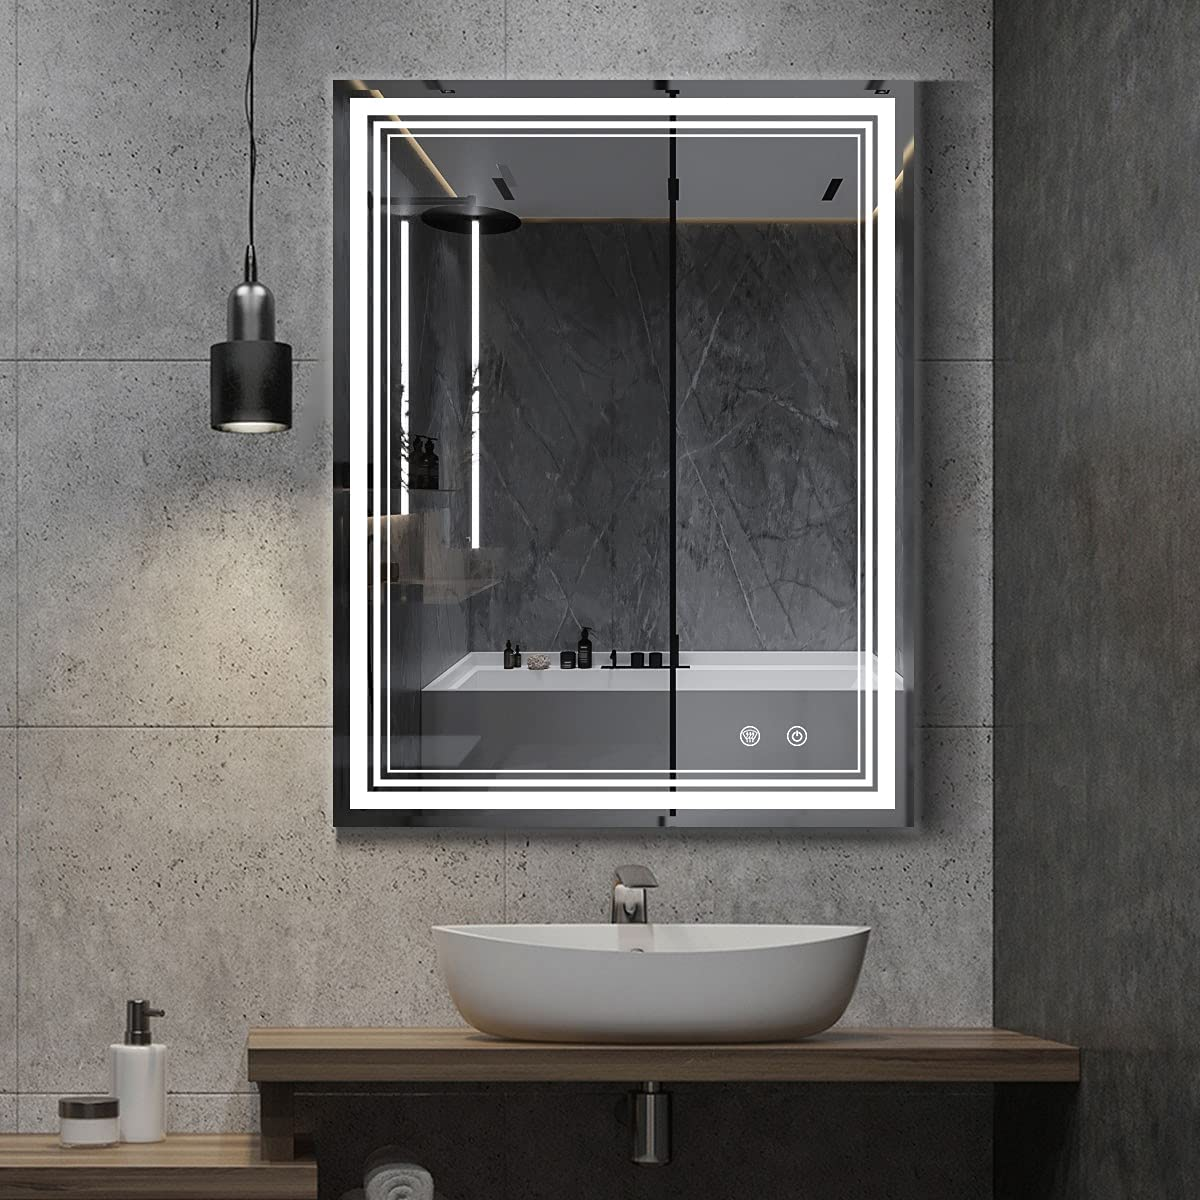 IOWVOE Baltimore Mall 36 x 28 Inch LED Mirr Vanity Bathroom Mirror Mounted Max 90% OFF Wall